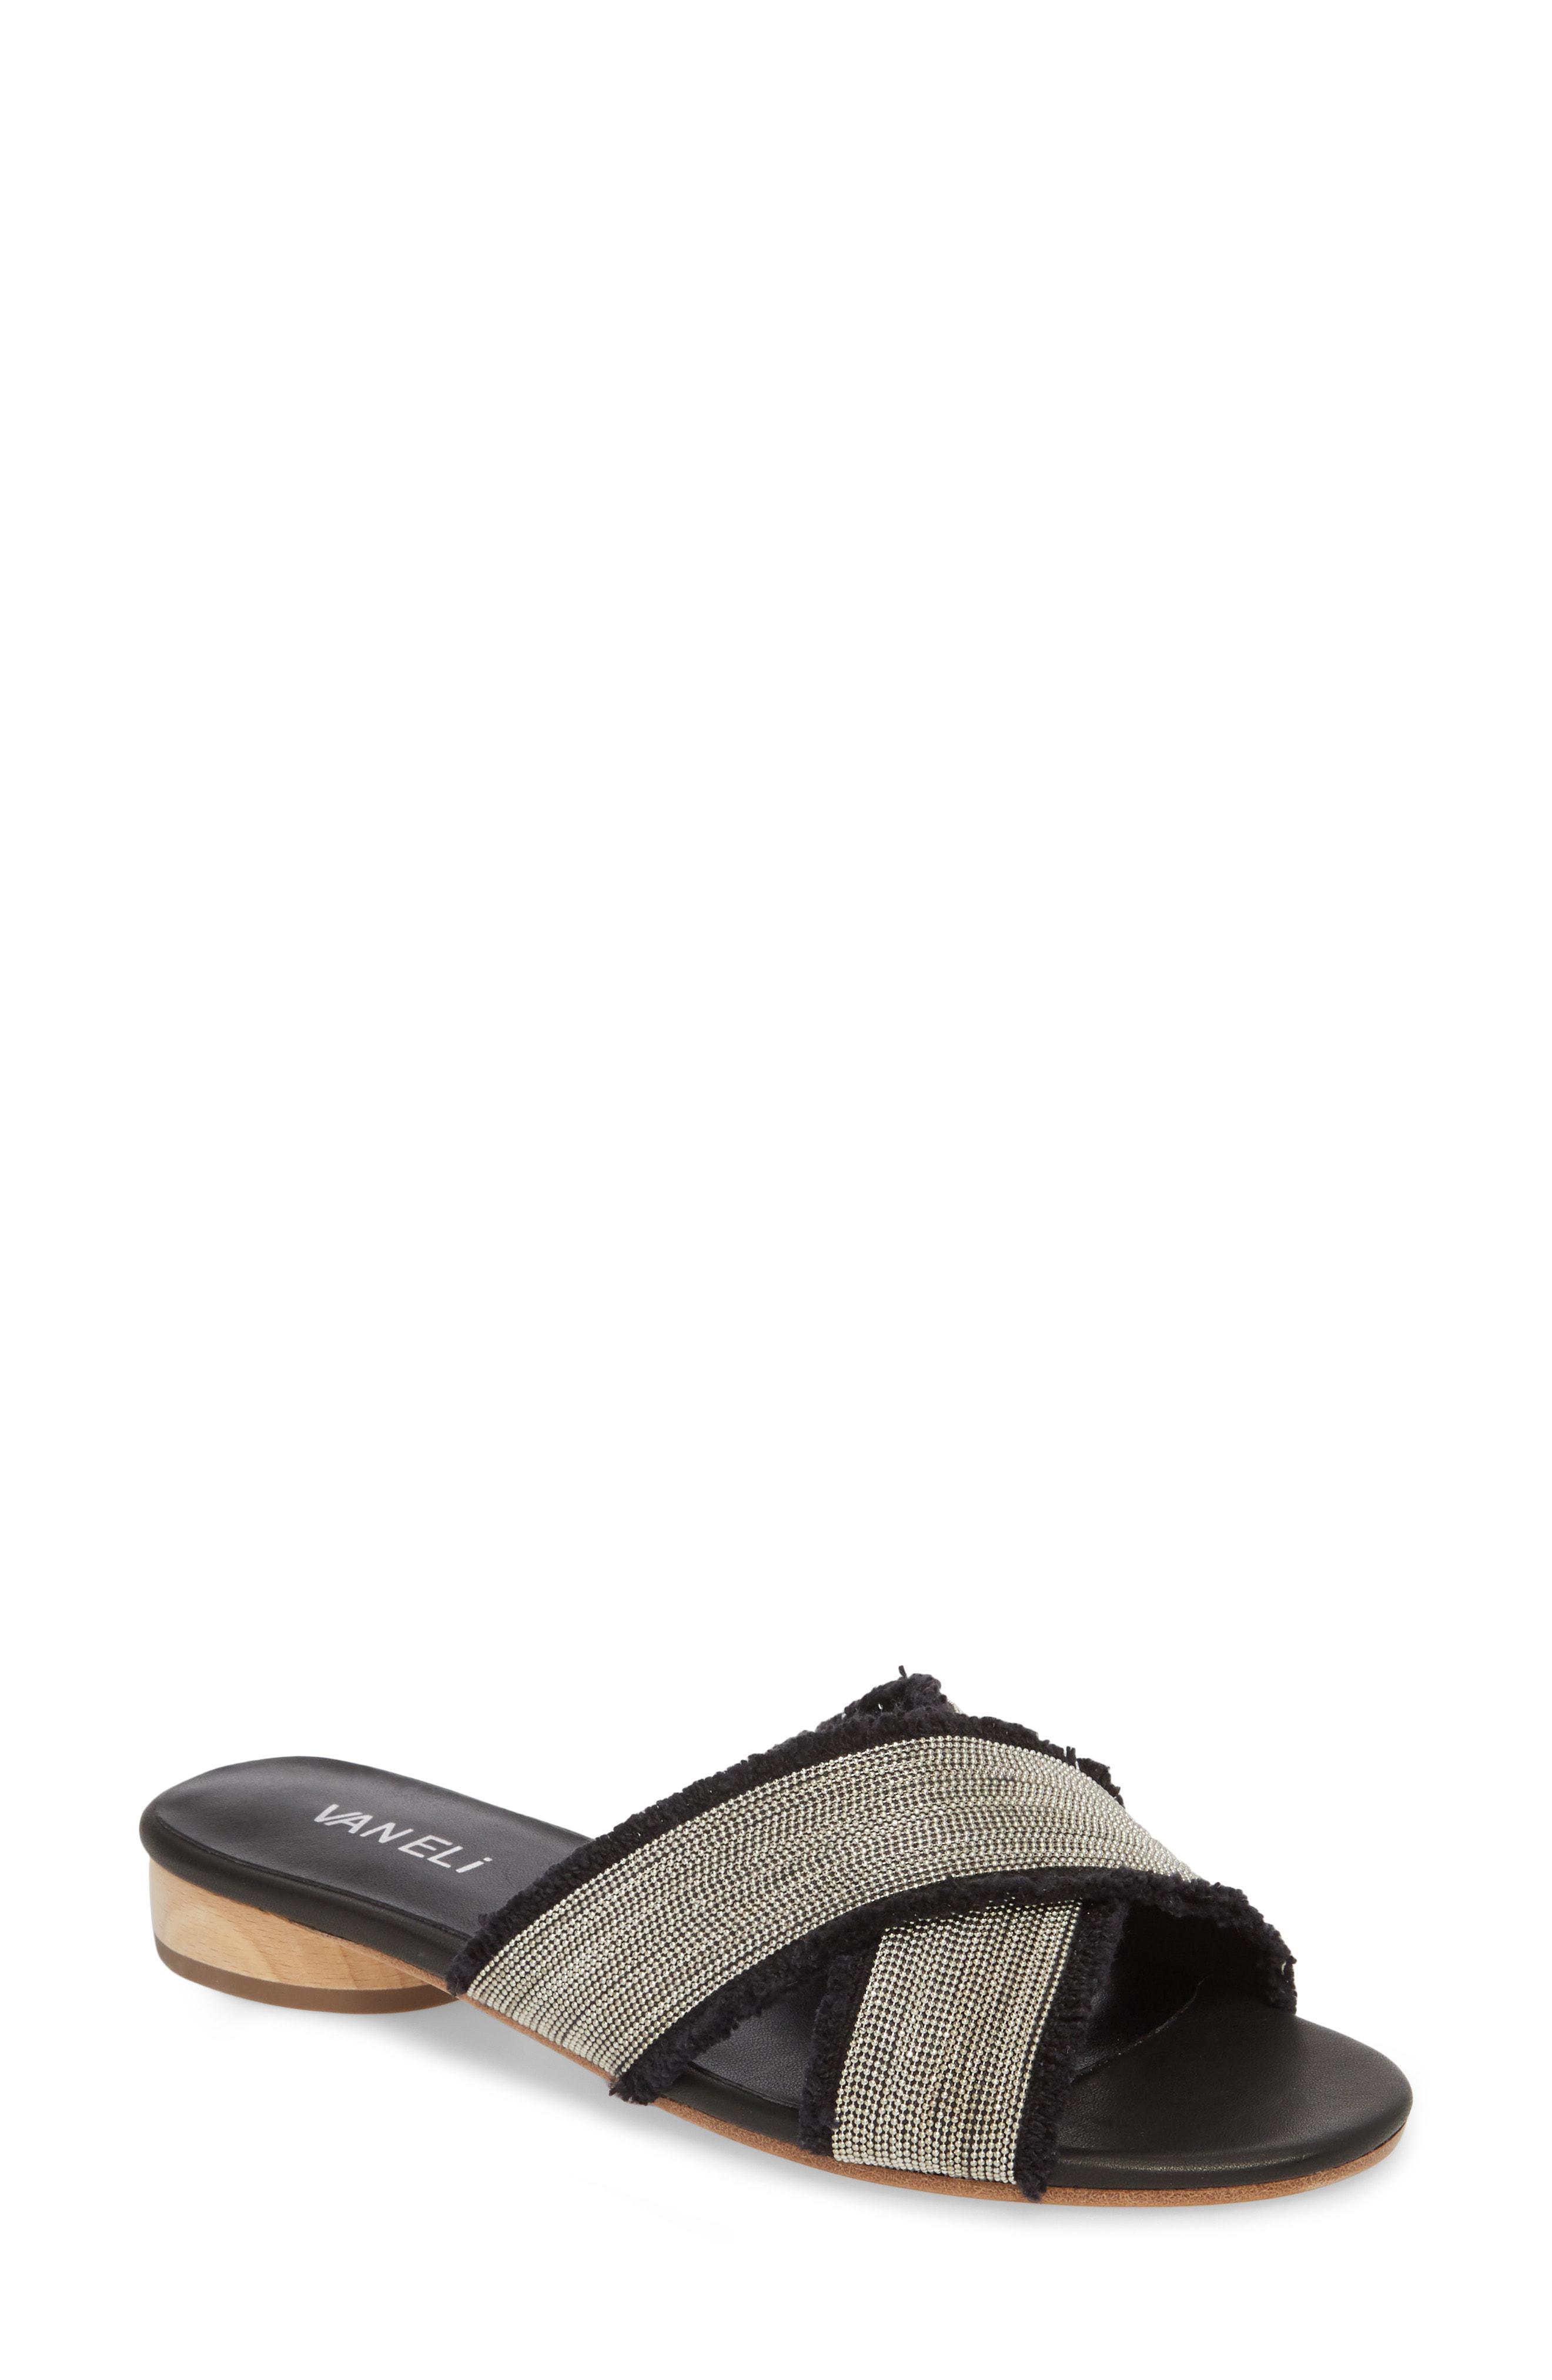 796eecff88e Lyst - Vaneli Baret Embellished Cross Strap Slide Sandal in Black